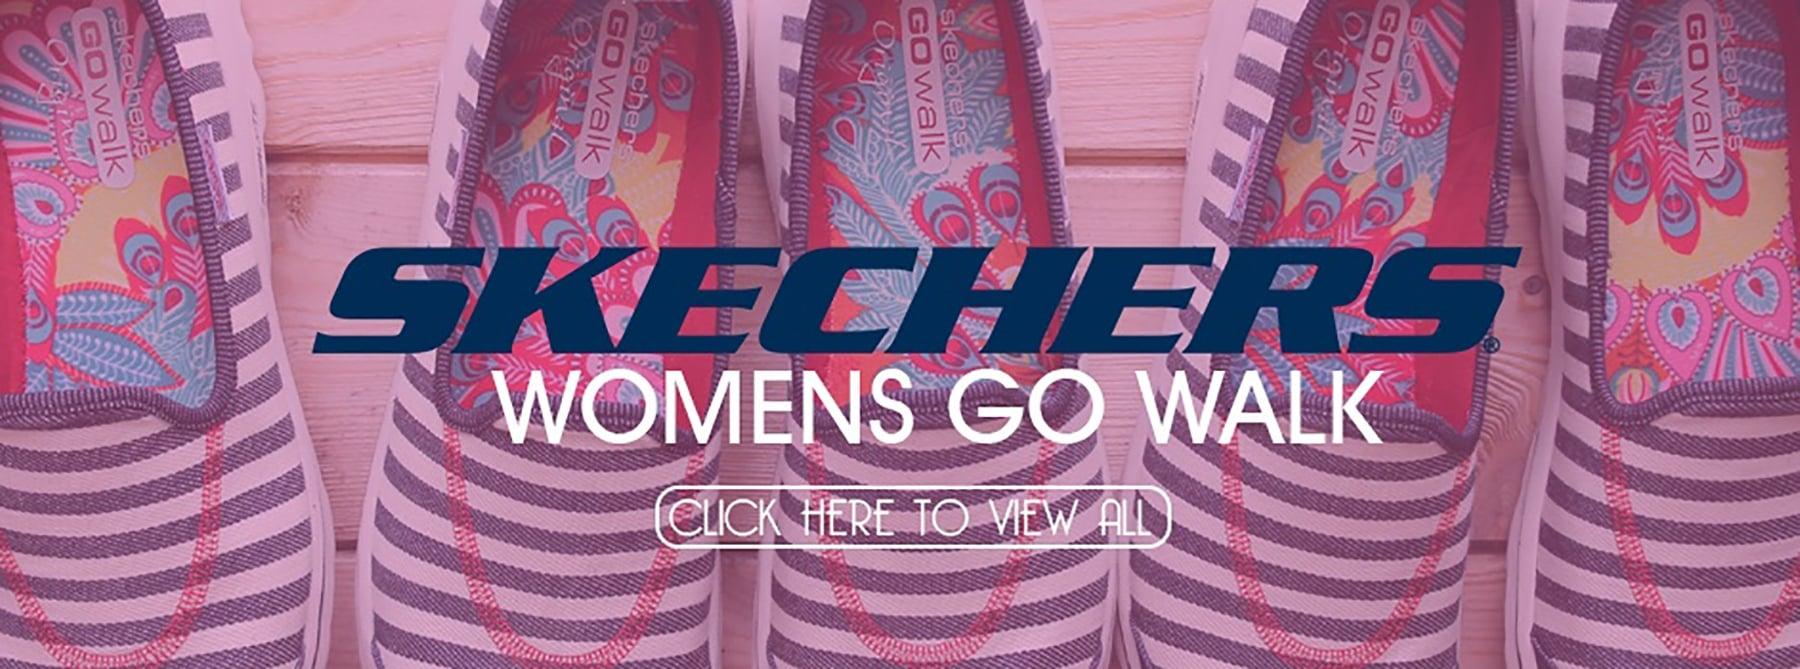 skechers go walk 2 womens uk